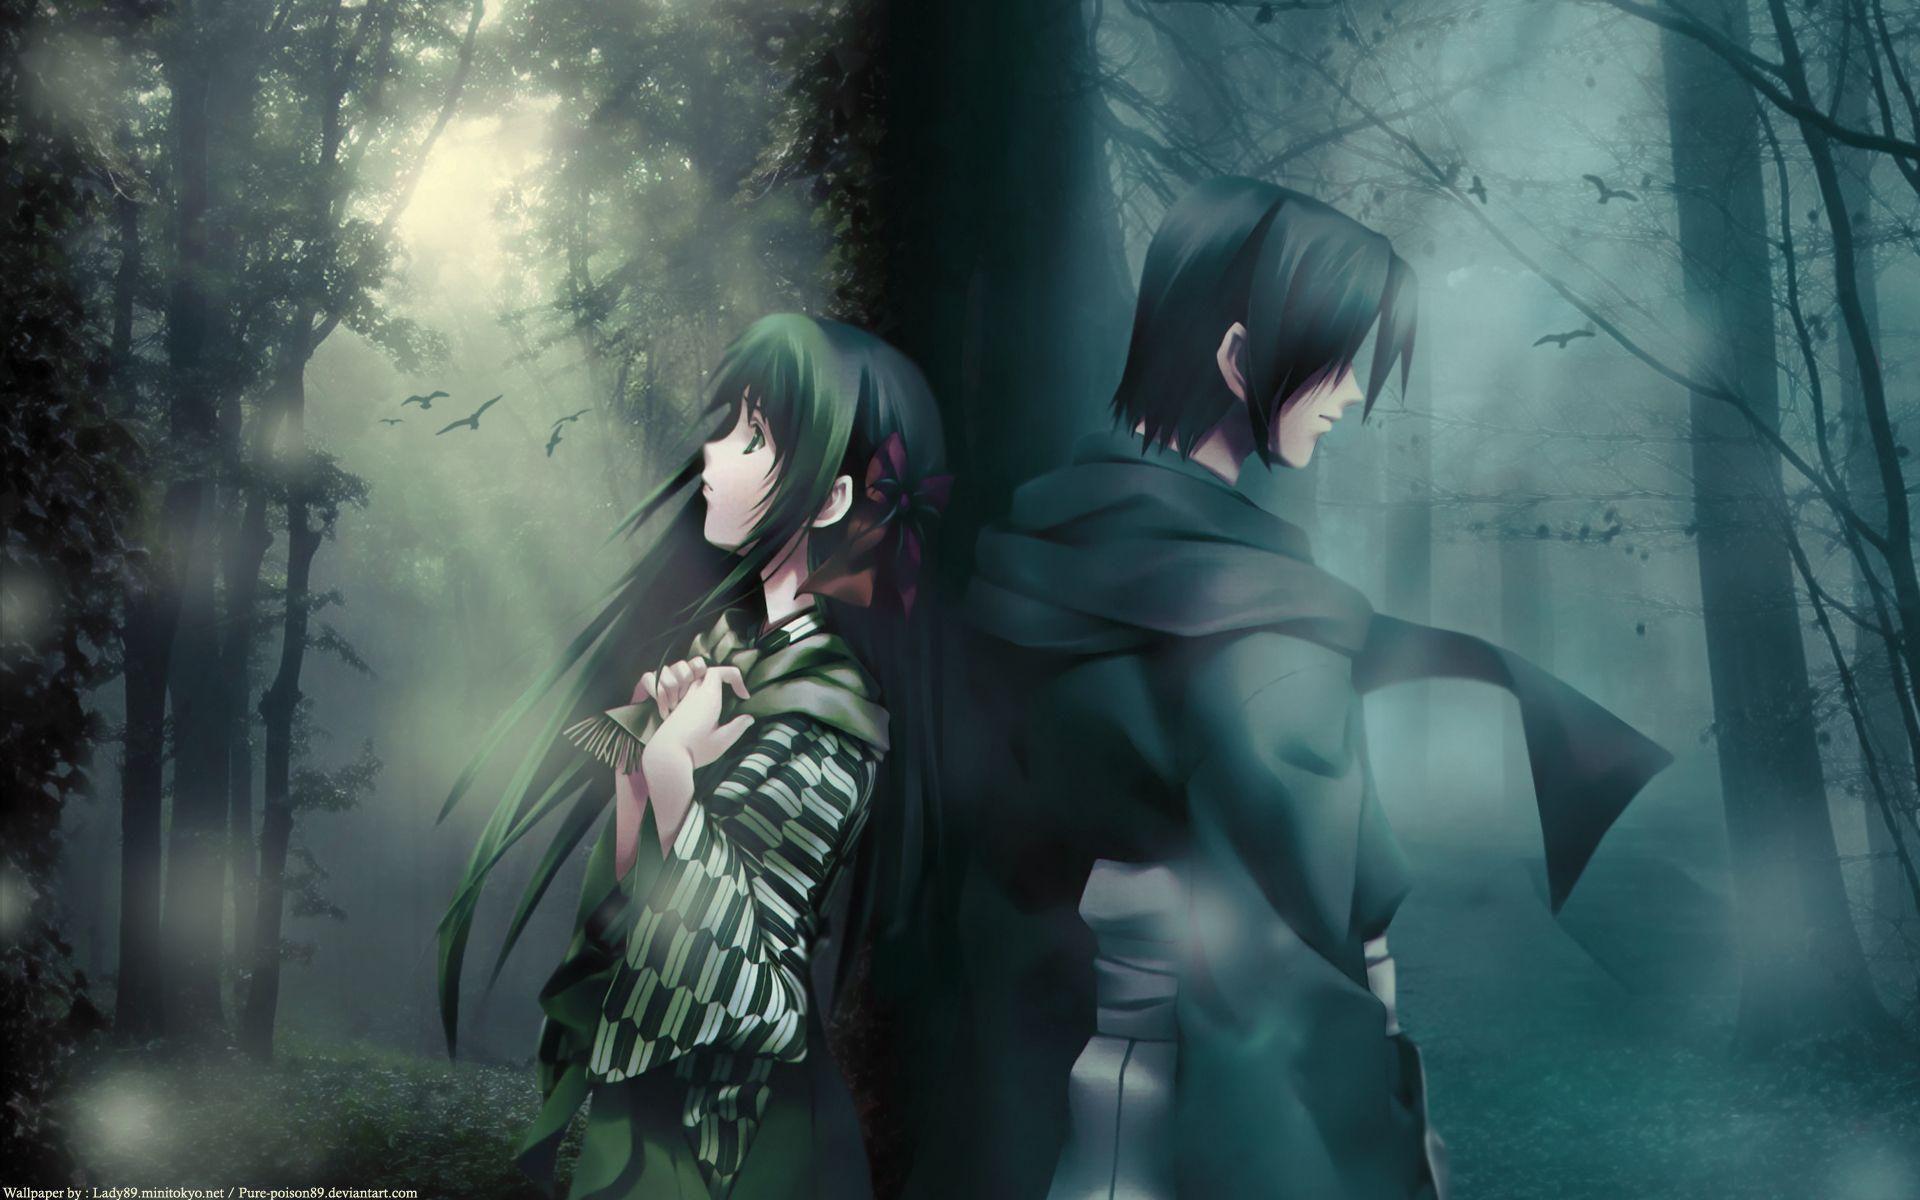 Pin On Anime Wallpaper Anime couple heart wallpaper